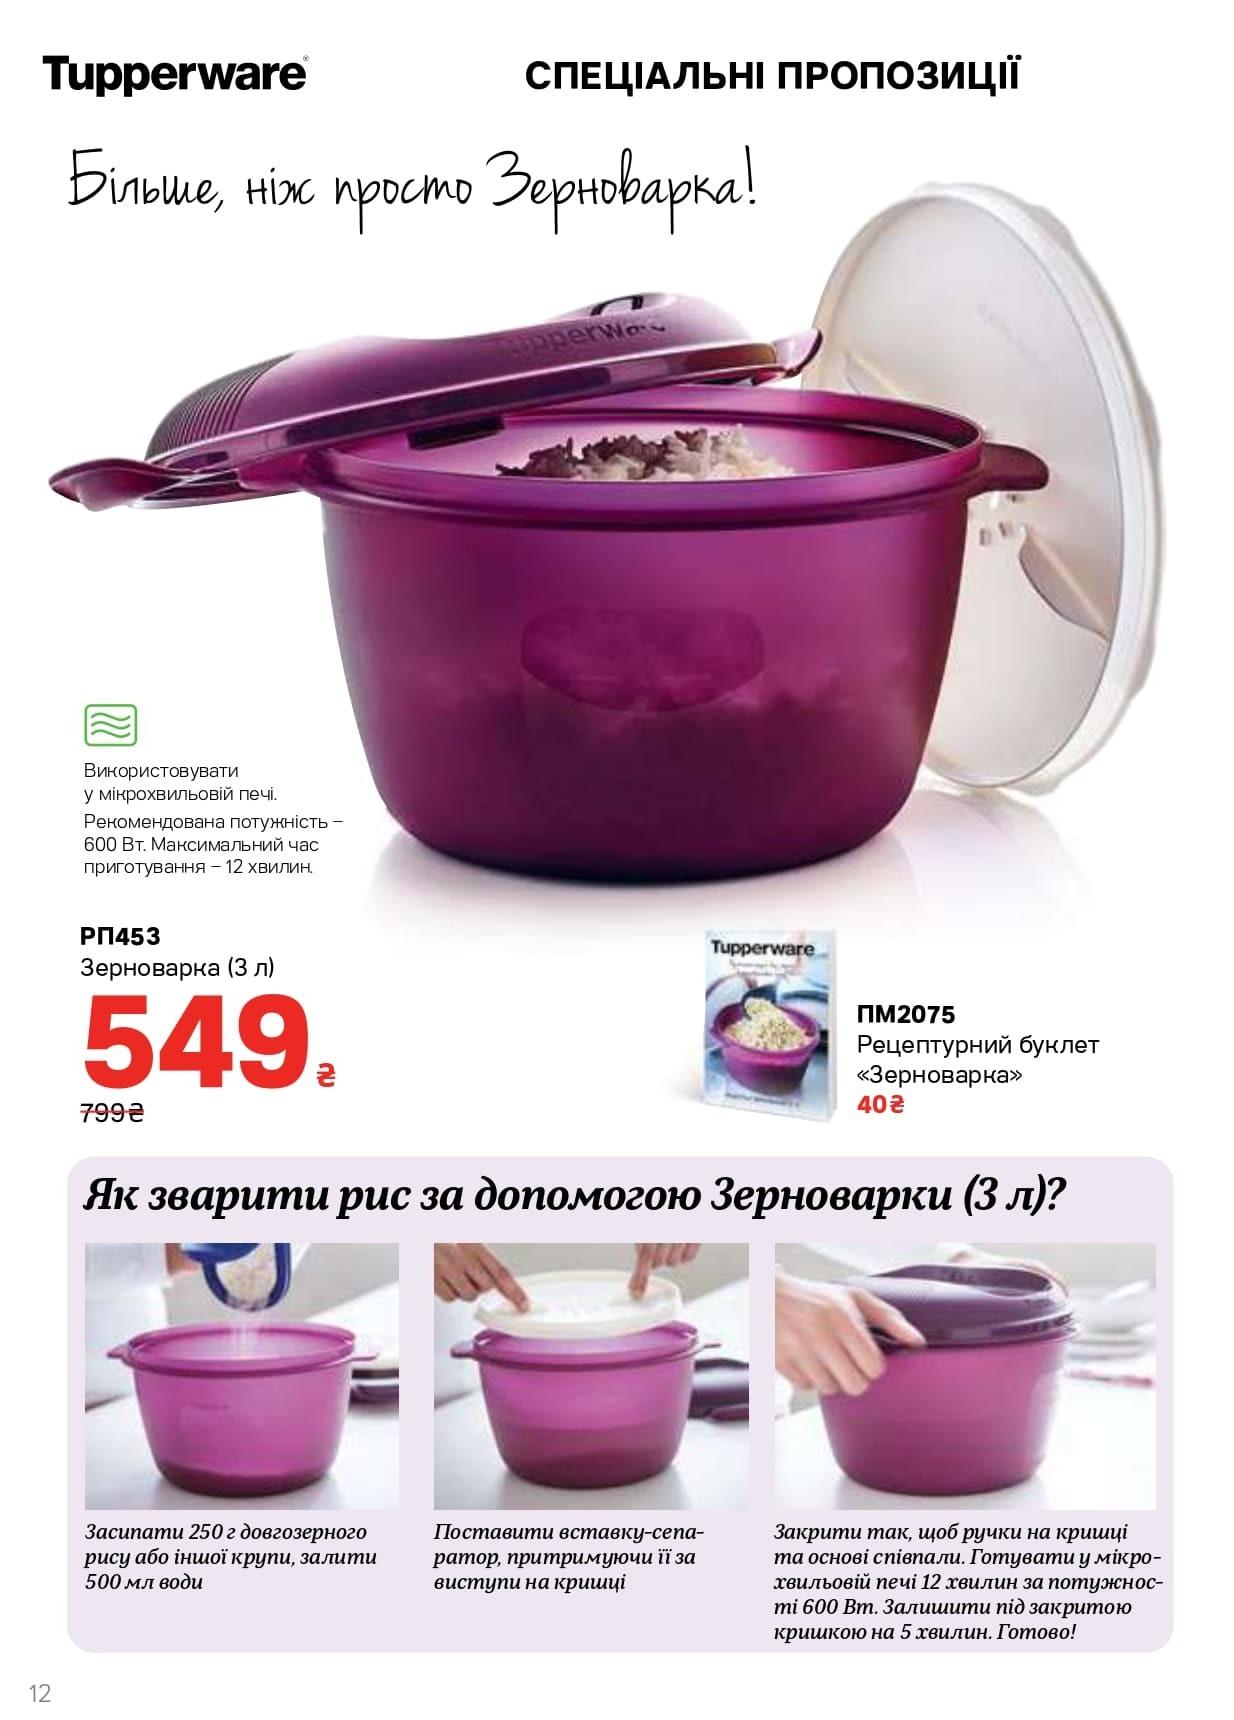 Зерноварка tupperware, цена снижена на 31%